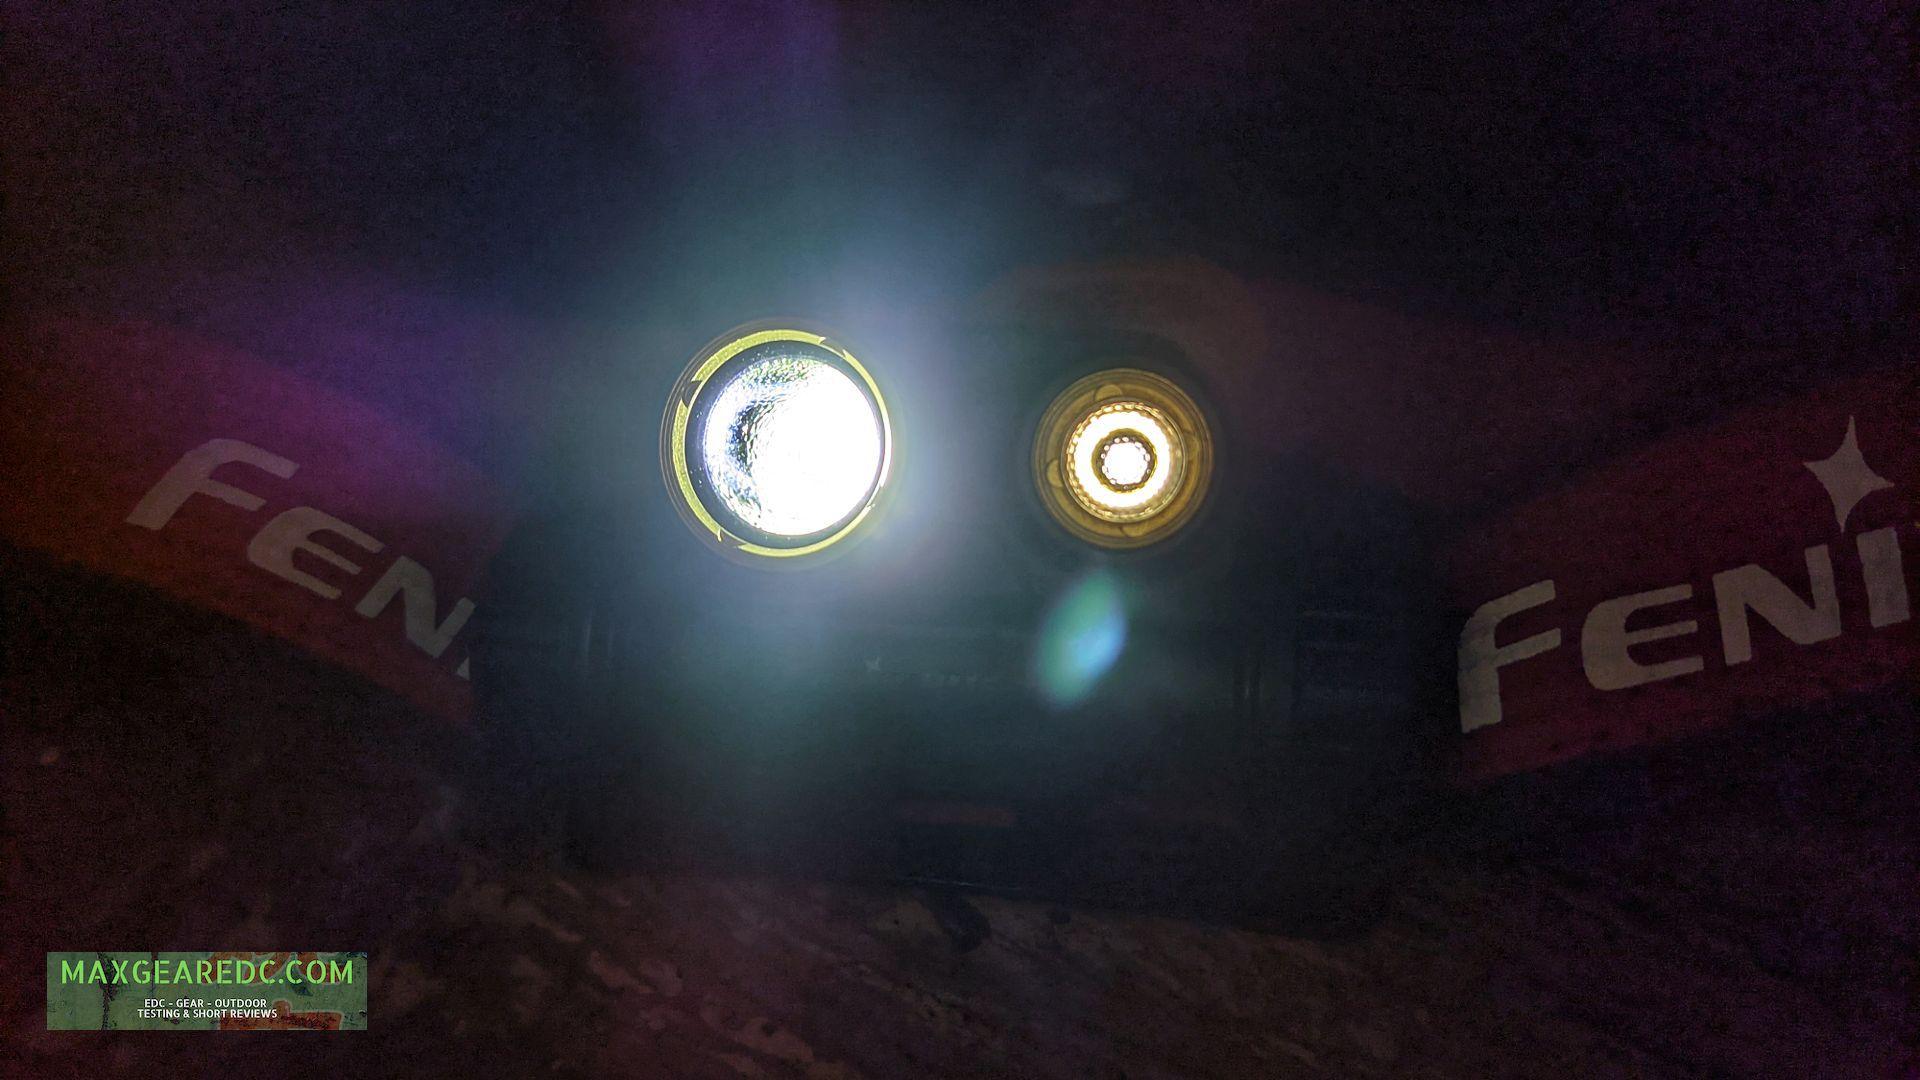 Fenix_HM65R-T_Flashlight_Review_EDC_magnesium_18650_maxgearedc.com_EDC_GEAR_OUTDOOR_TESTING_and_SHORT_REVIEWS_18